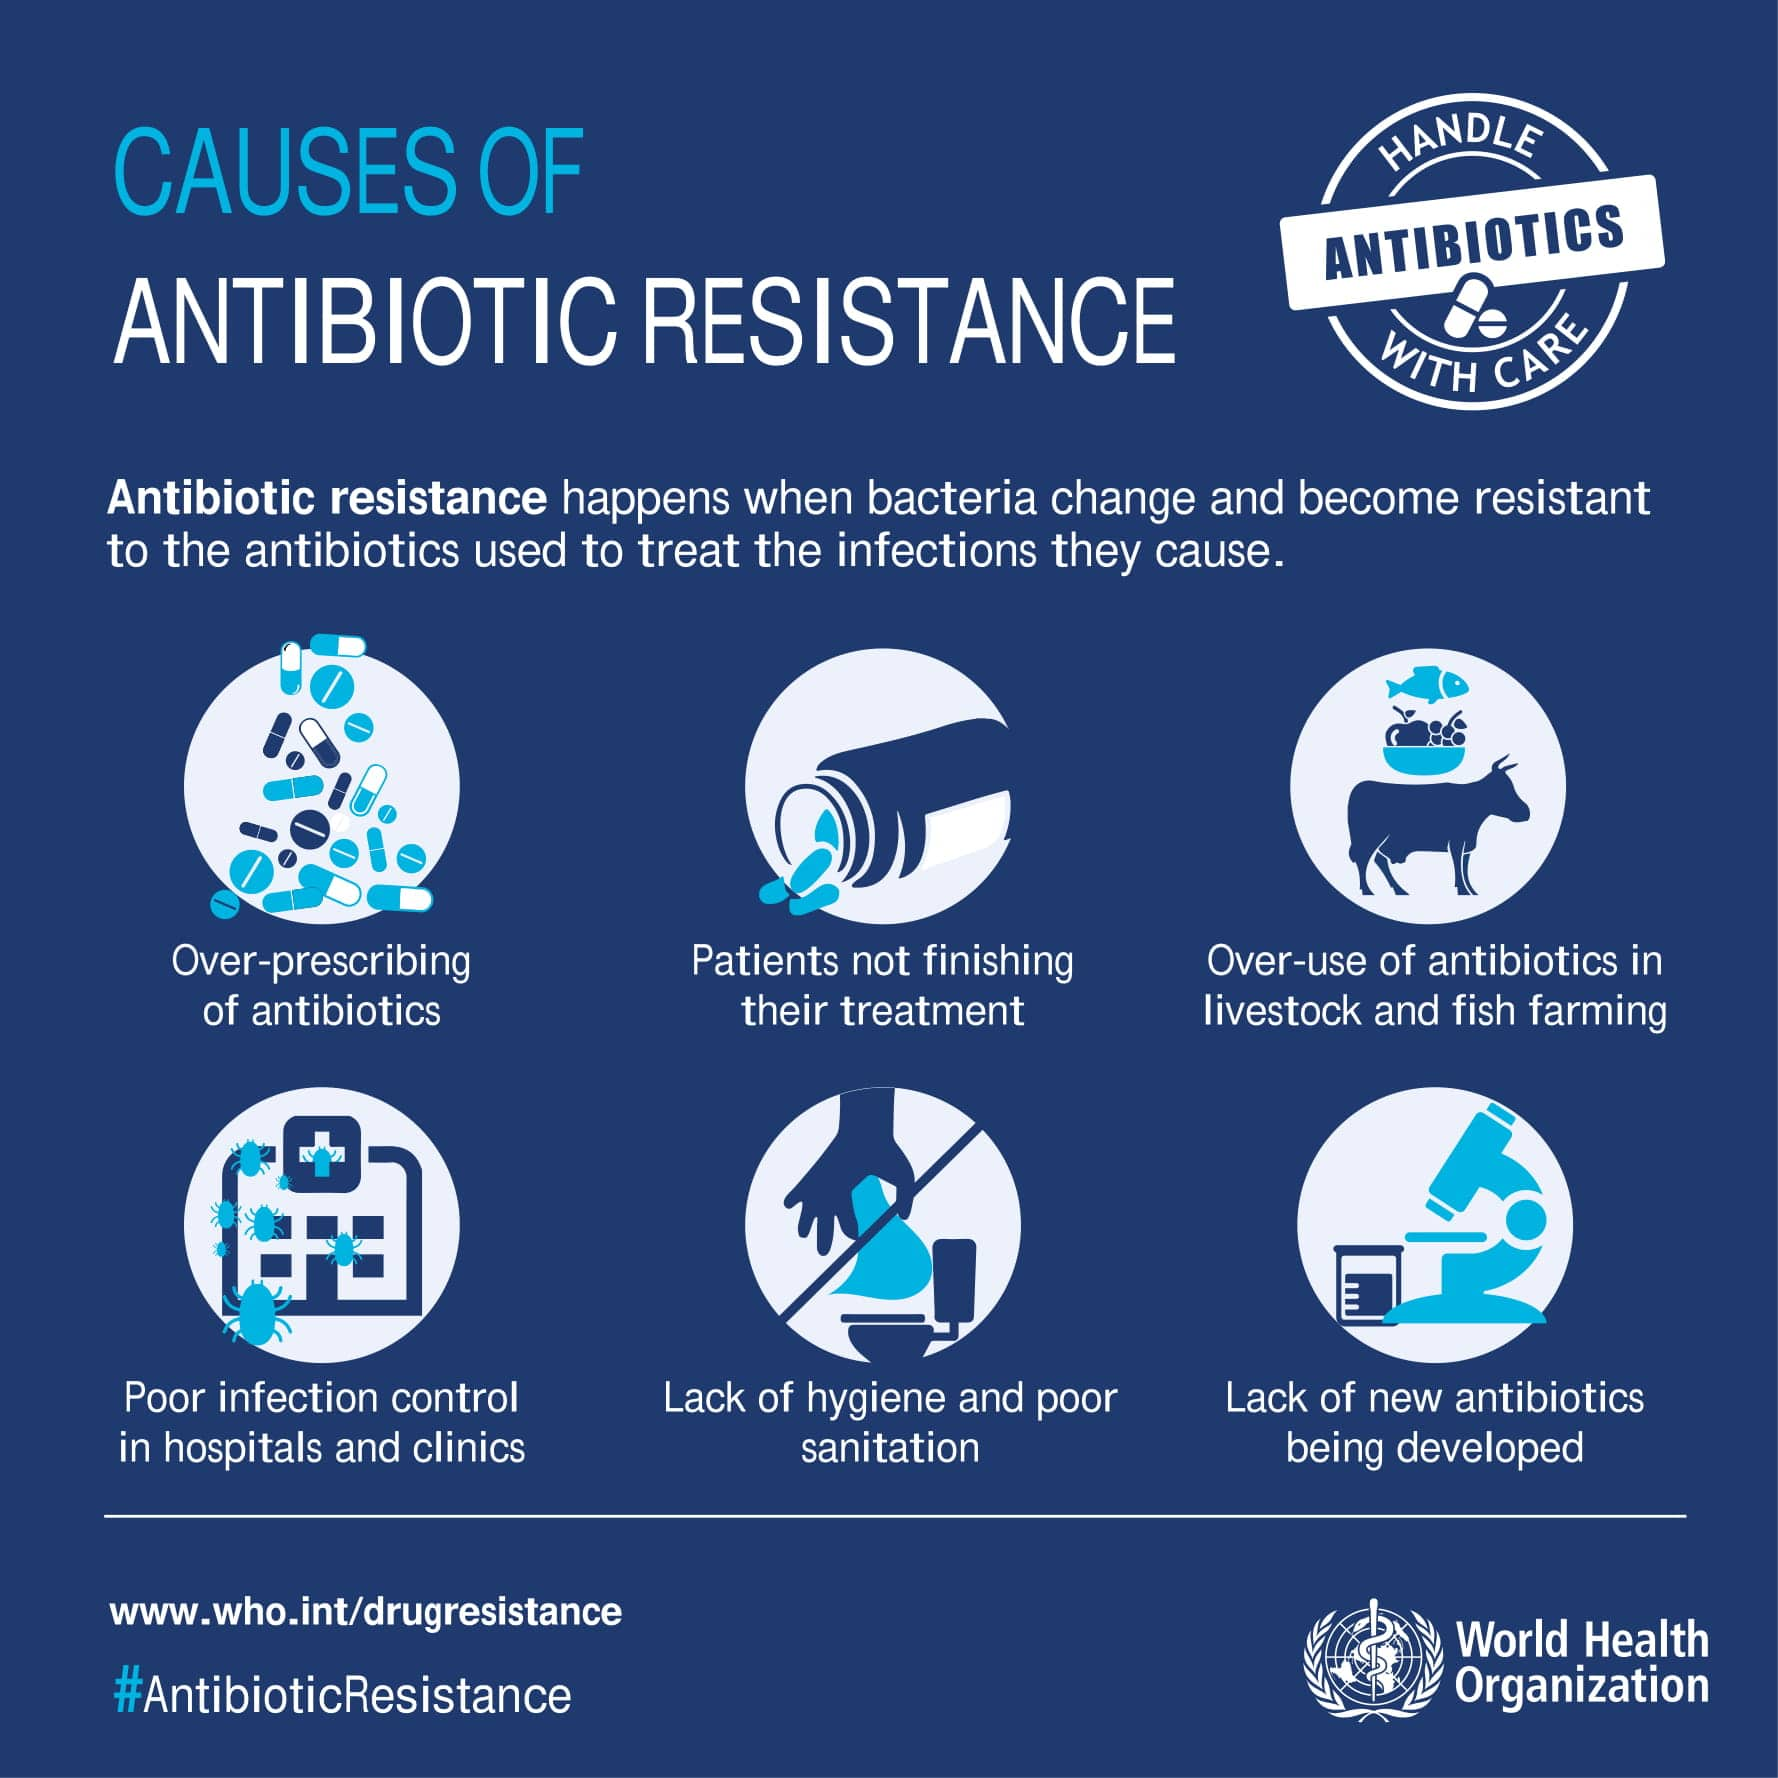 Causes of antibiotic resistance